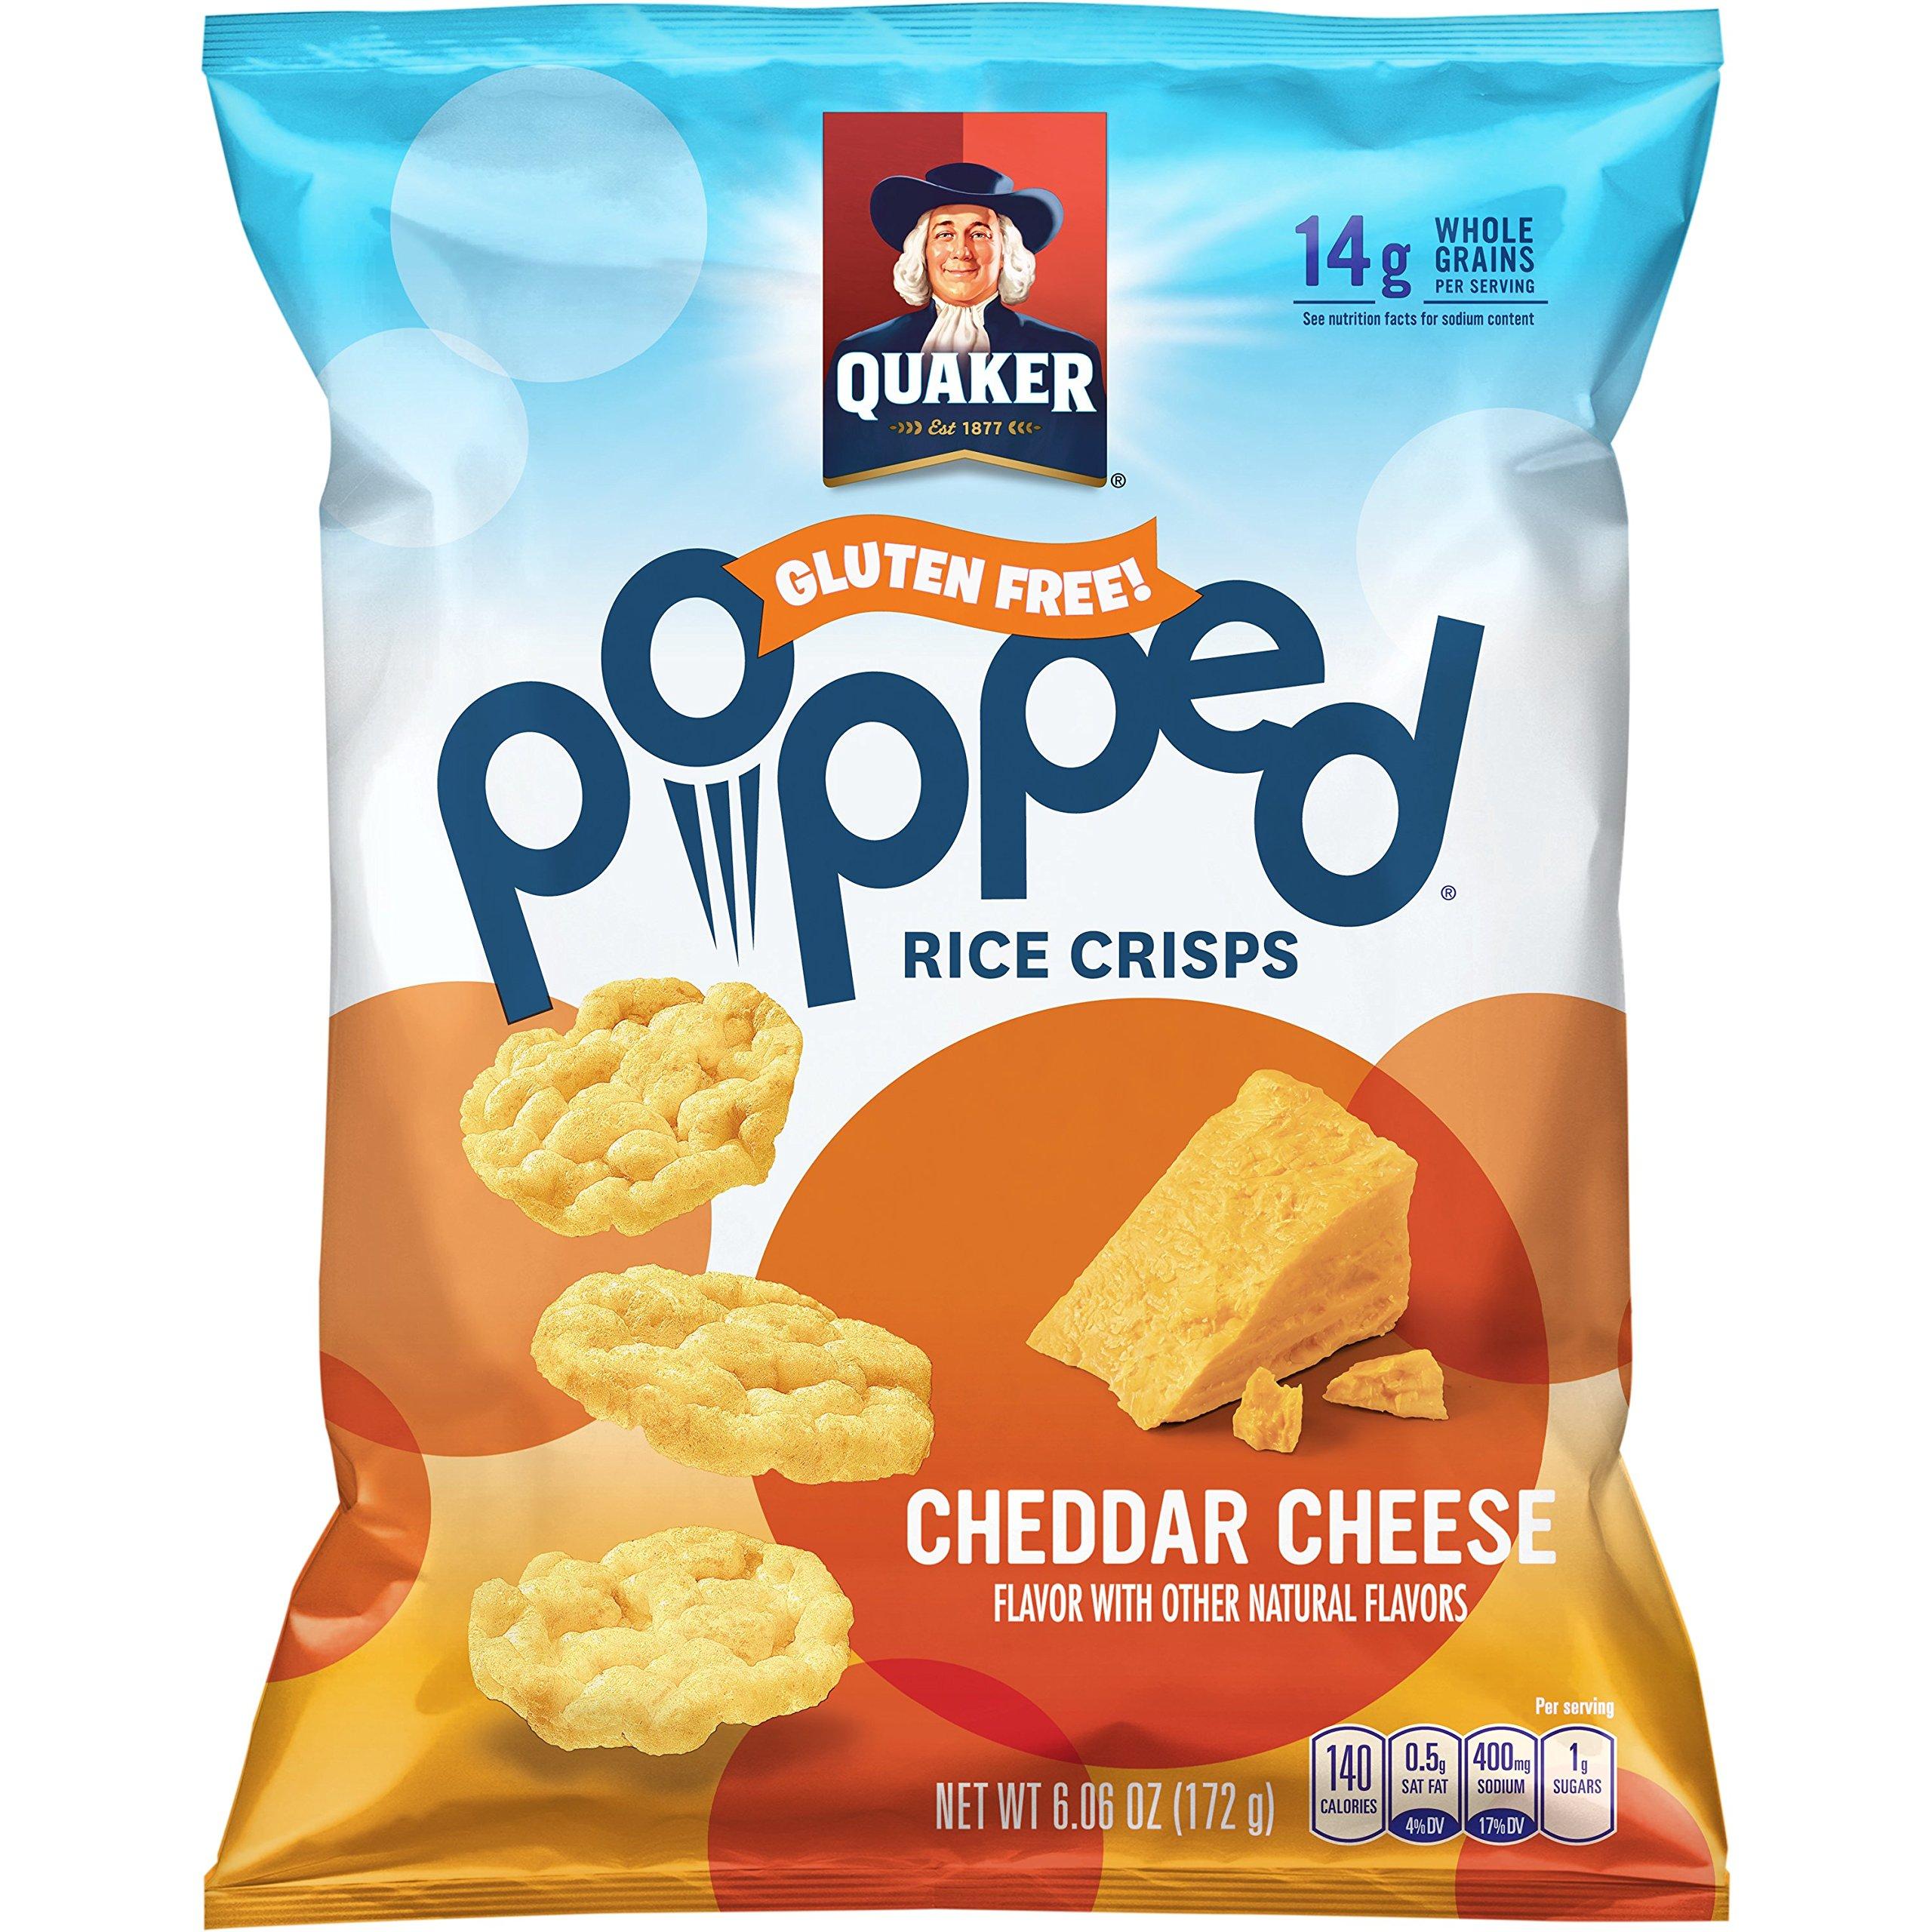 Quaker Popped Rice Crisp Snacks, Gluten Free, Cheddar Cheese, 6.06 Ounce Bag